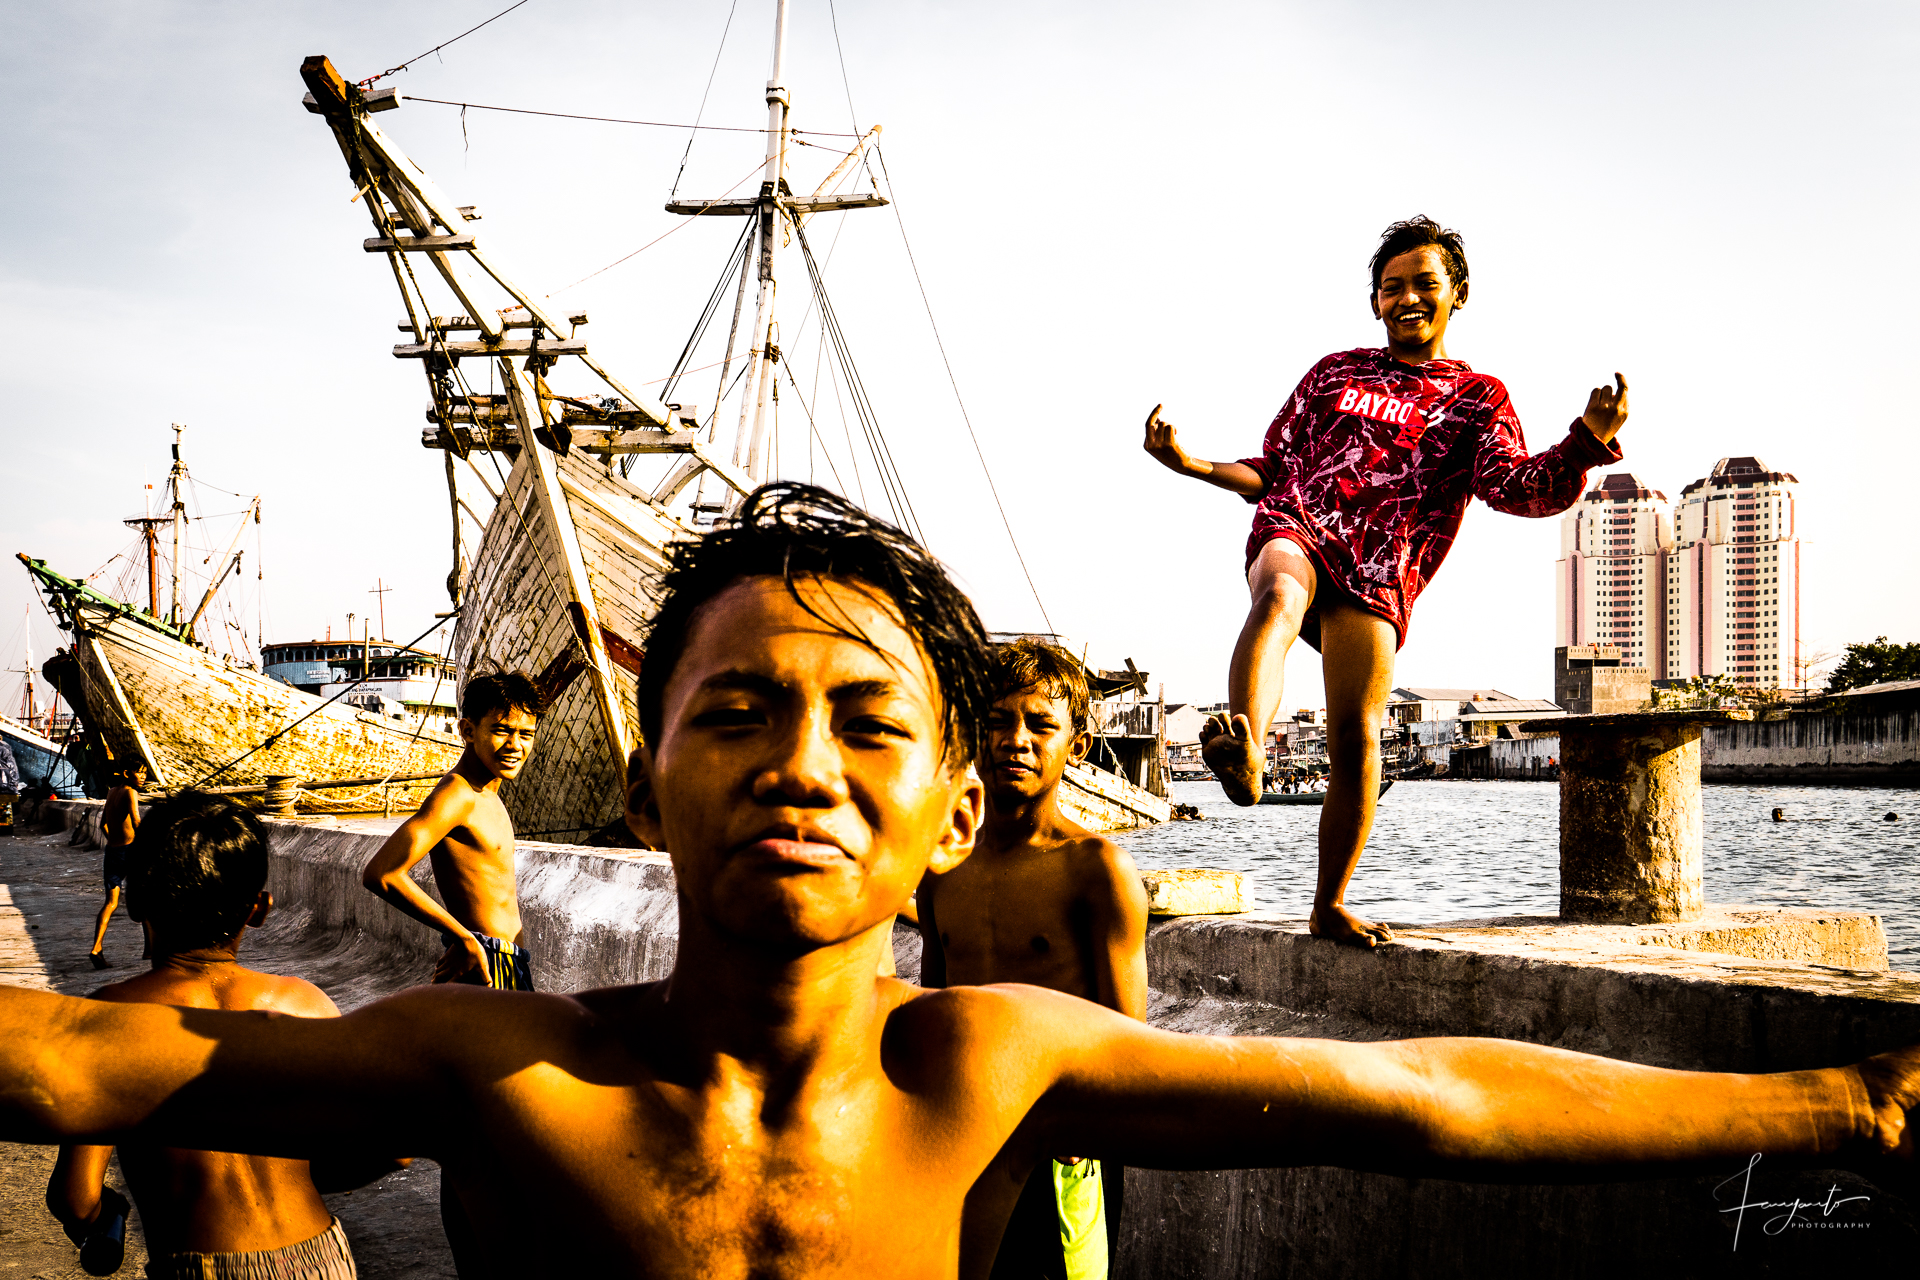 Sunda Kelapa Harbor Dock, Indonesia